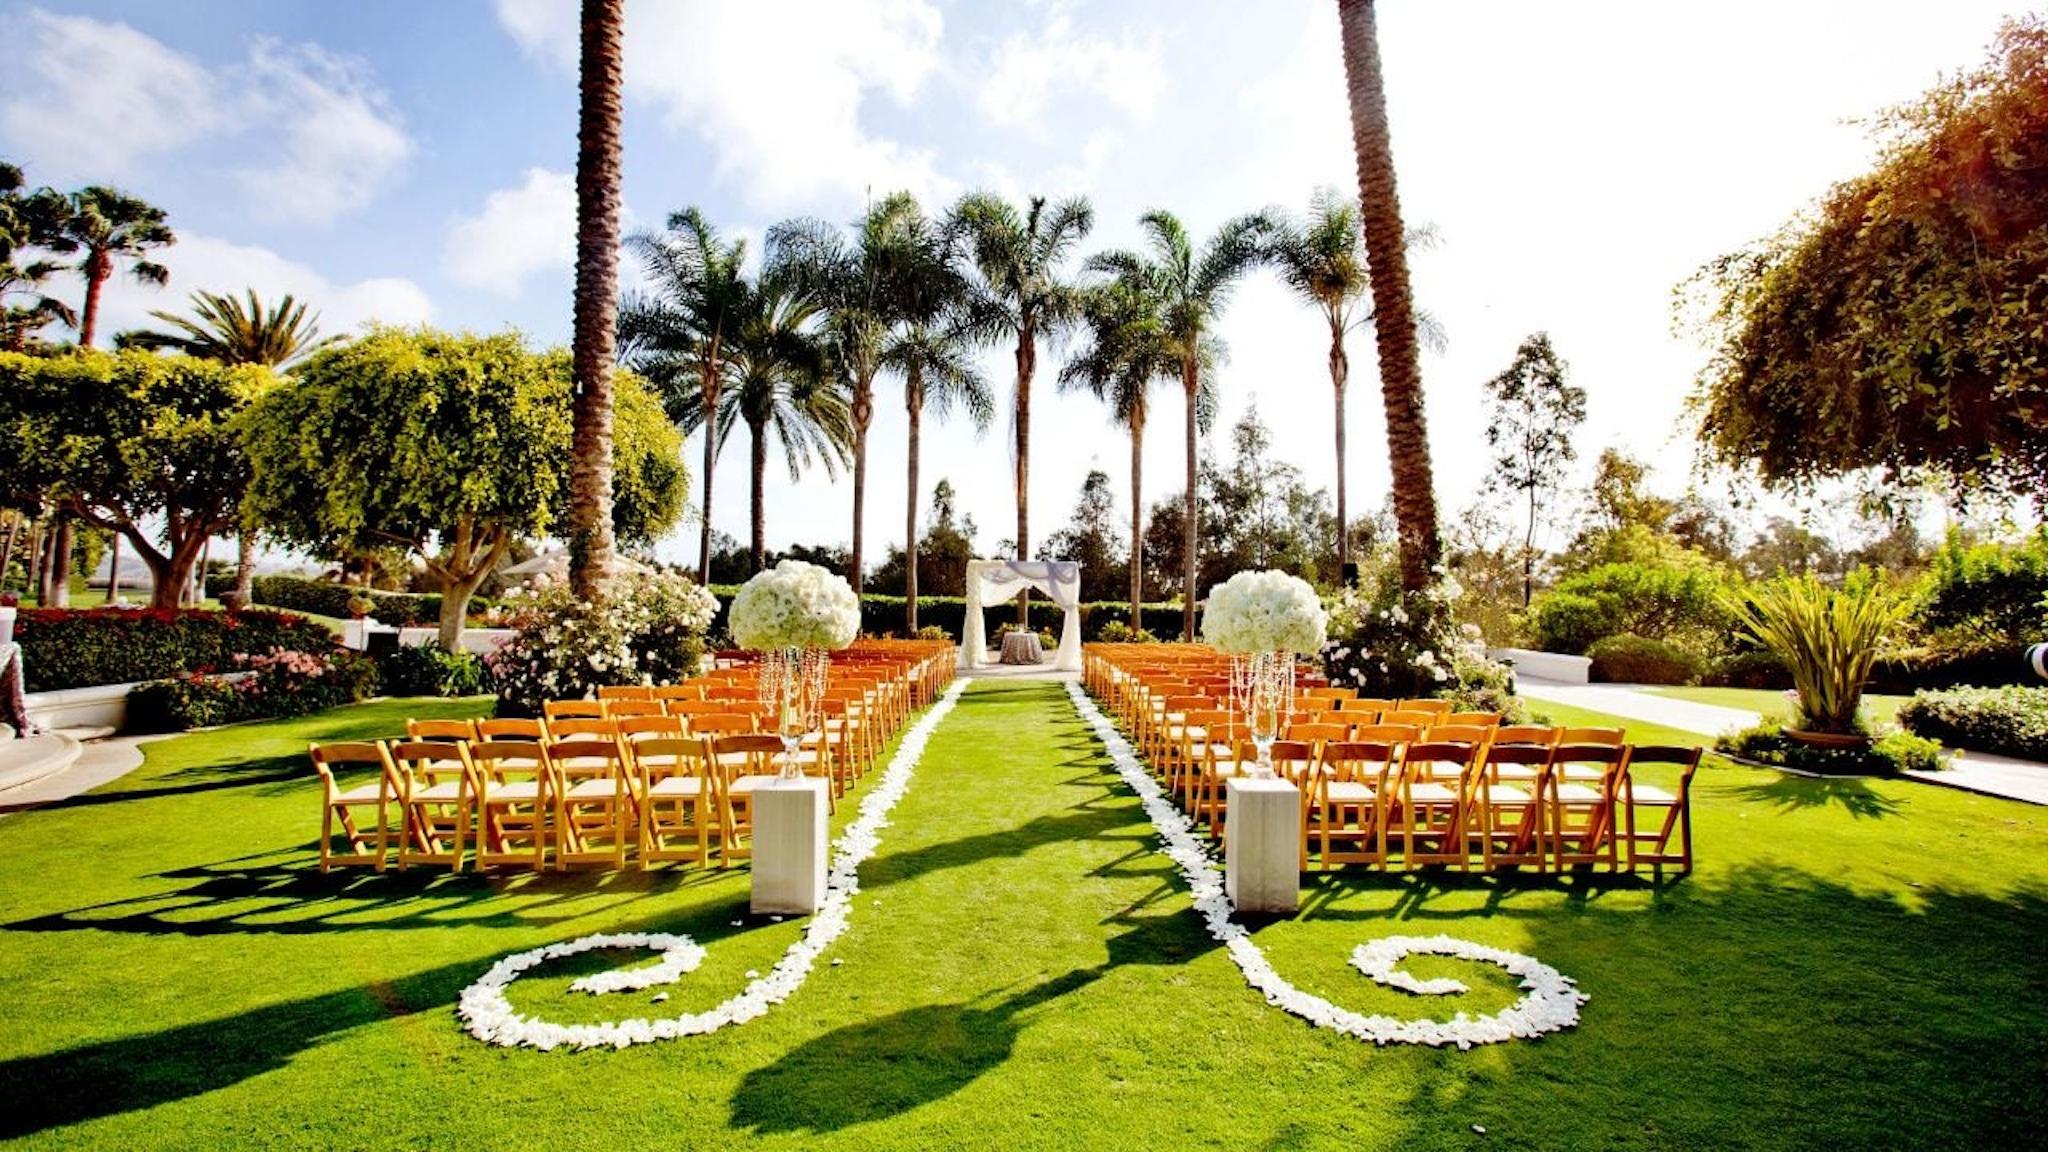 Park Hyatt Aviara Resort San Diego lawn